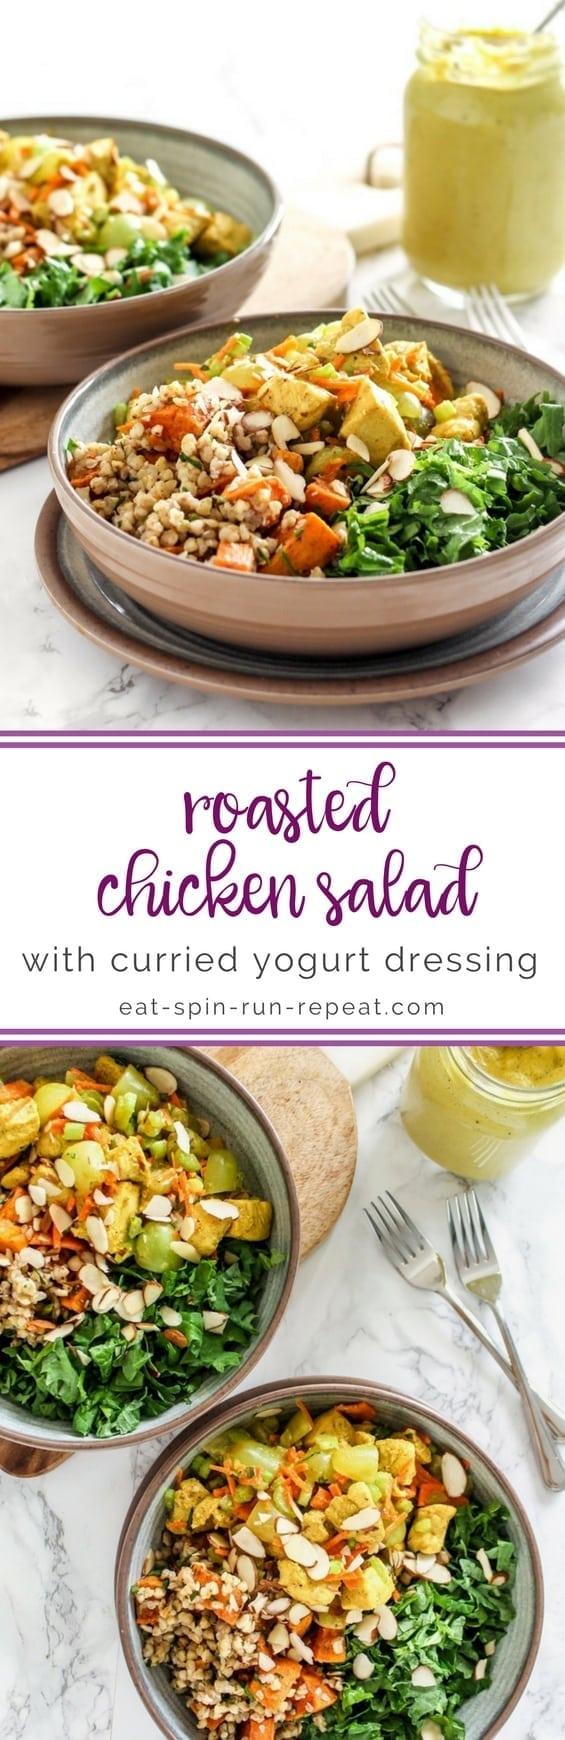 Roasted Chicken Salad with Curried Yogurt Dressing || #glutenfree #dairyfree #antiinflammatory || Eat Spin Run Repeat